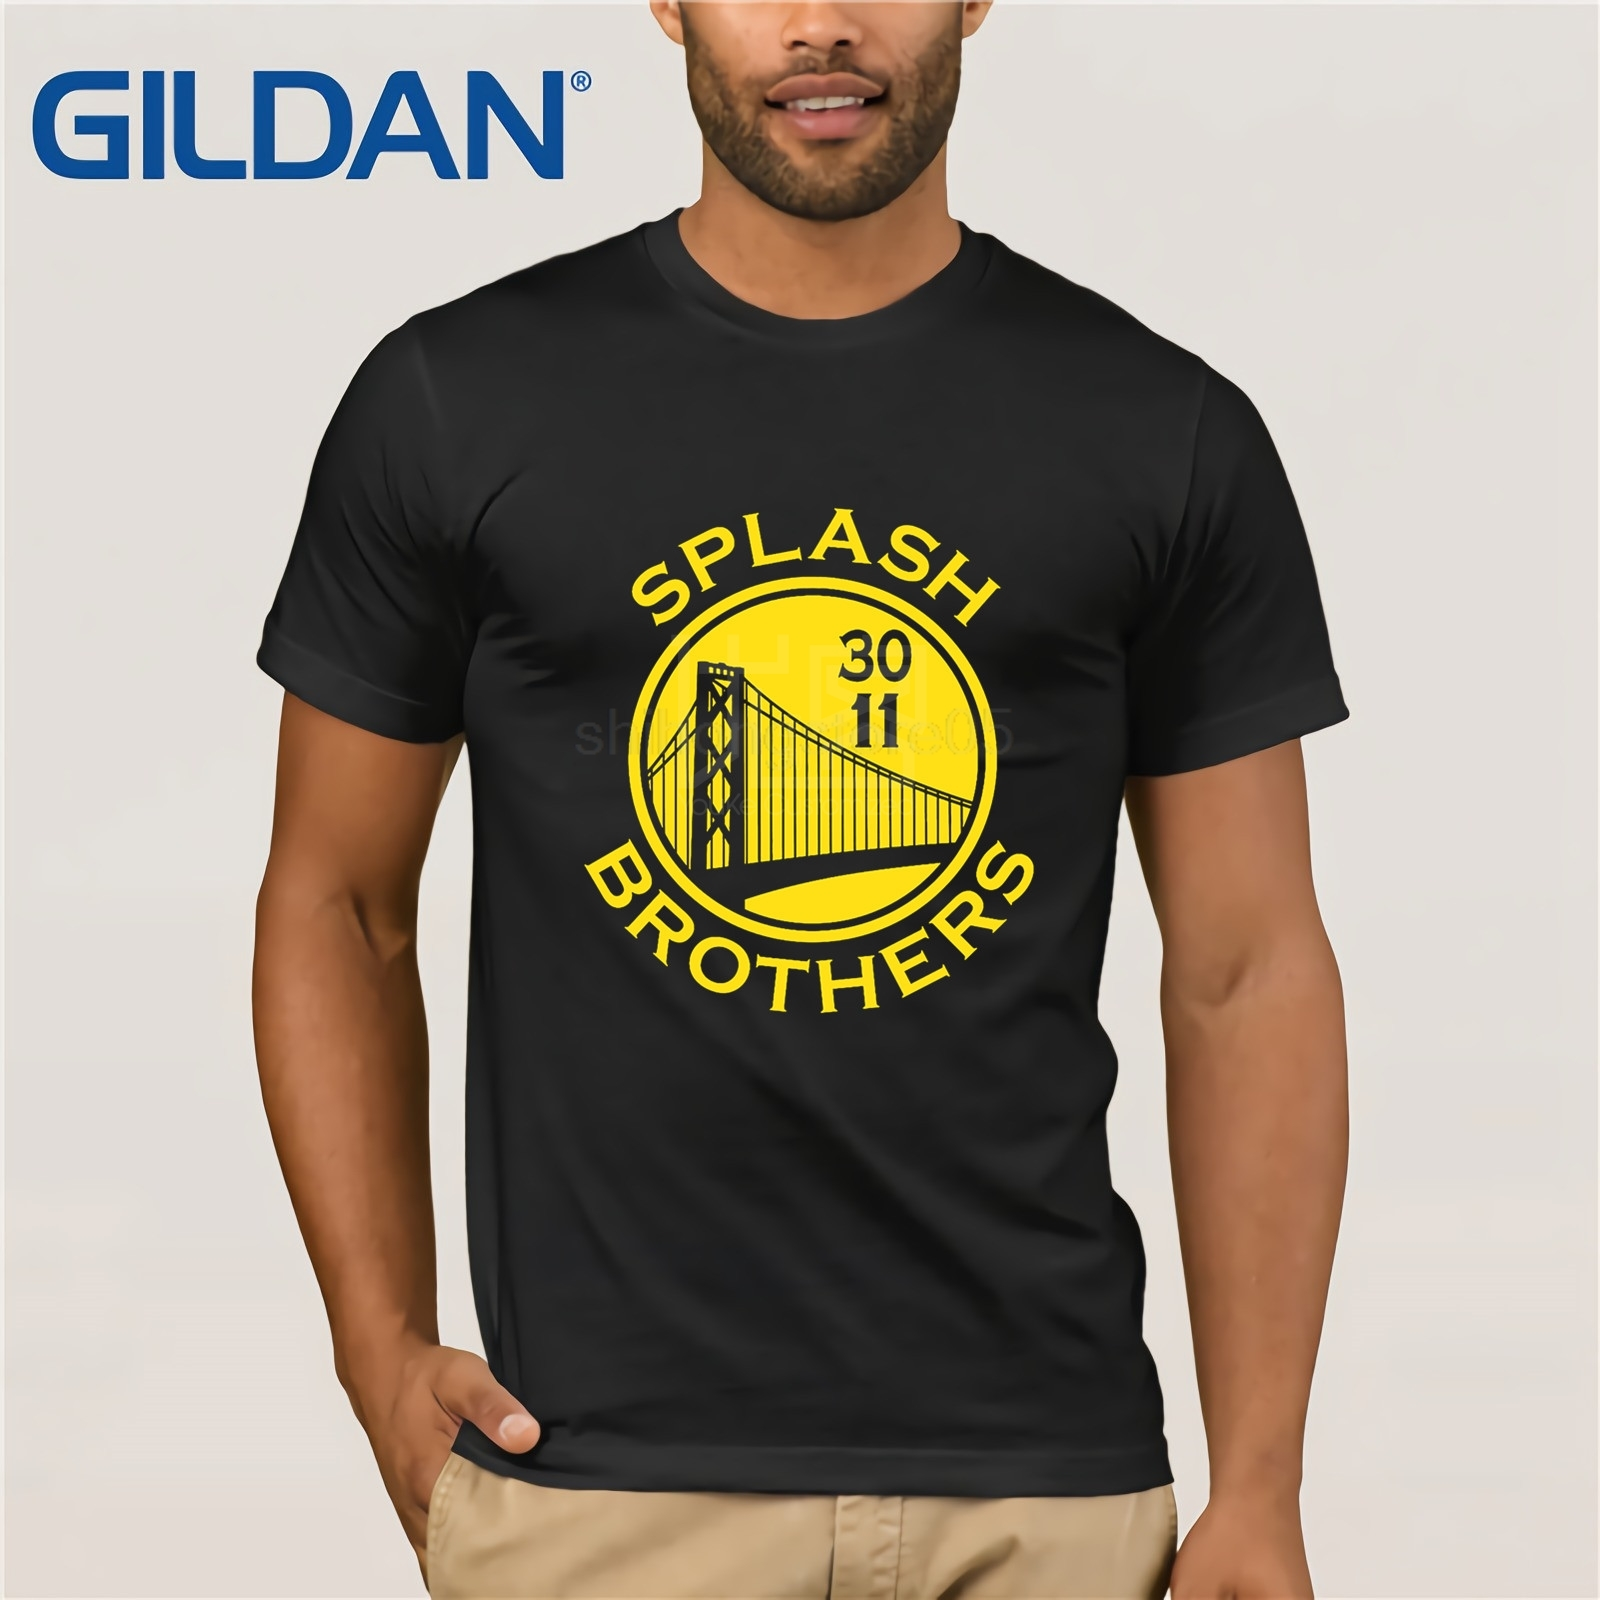 Designer T Shirt Hot Sale Super  Creative Splash Brothers Shirt Golden State Stephen Curry Klay Thompson Men's Tees